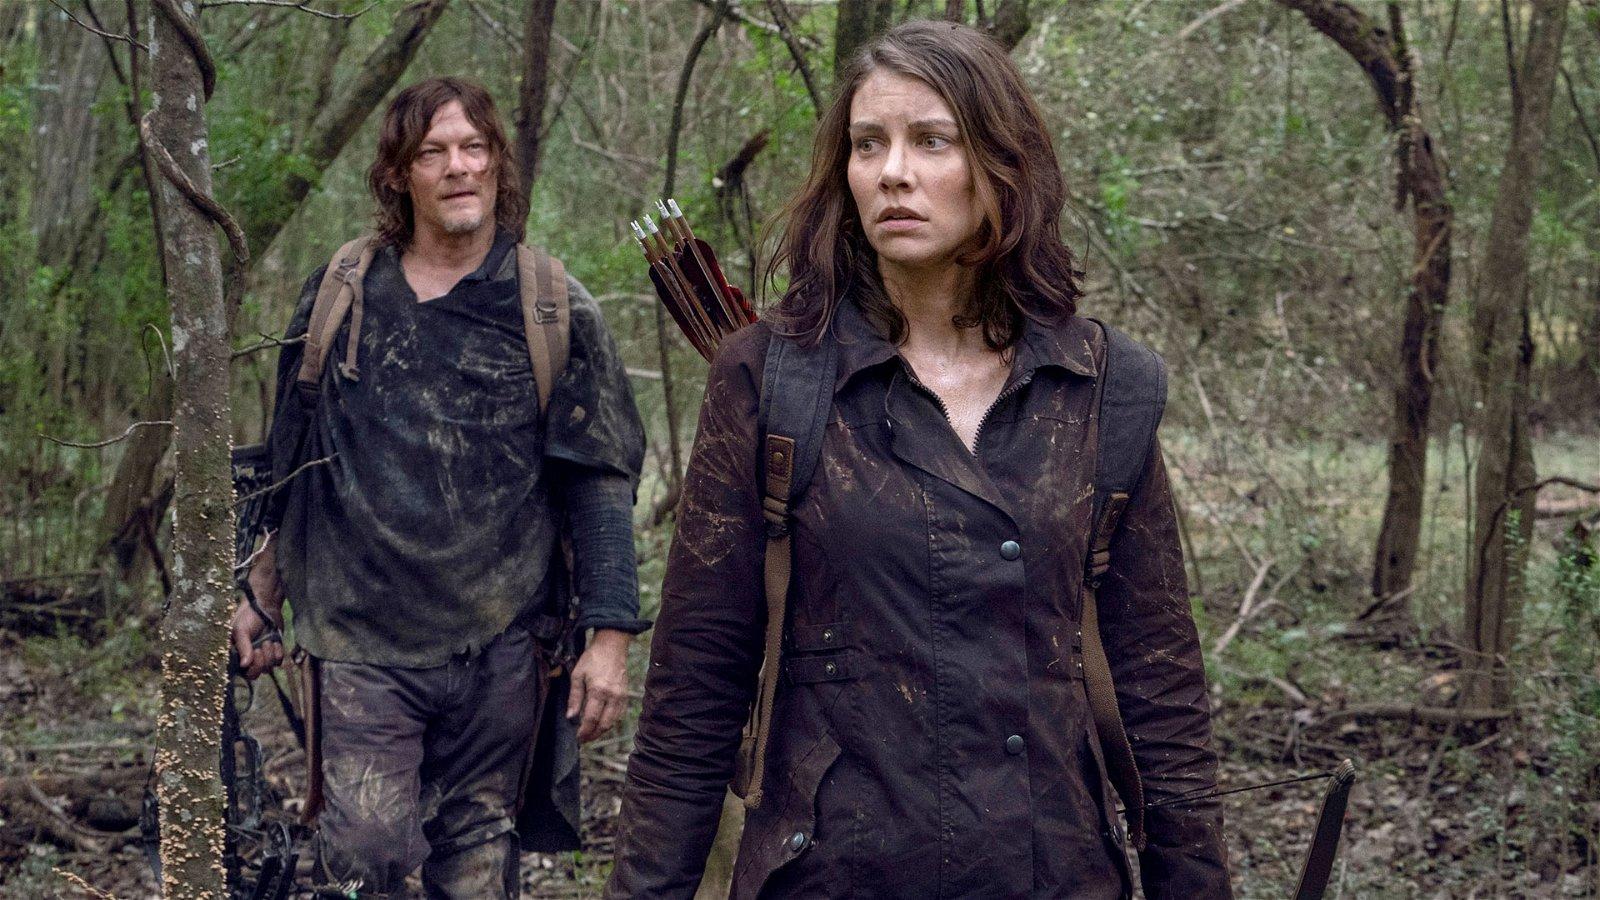 The Walking Dead Season 10 Returns with 6 Bonus Episodes